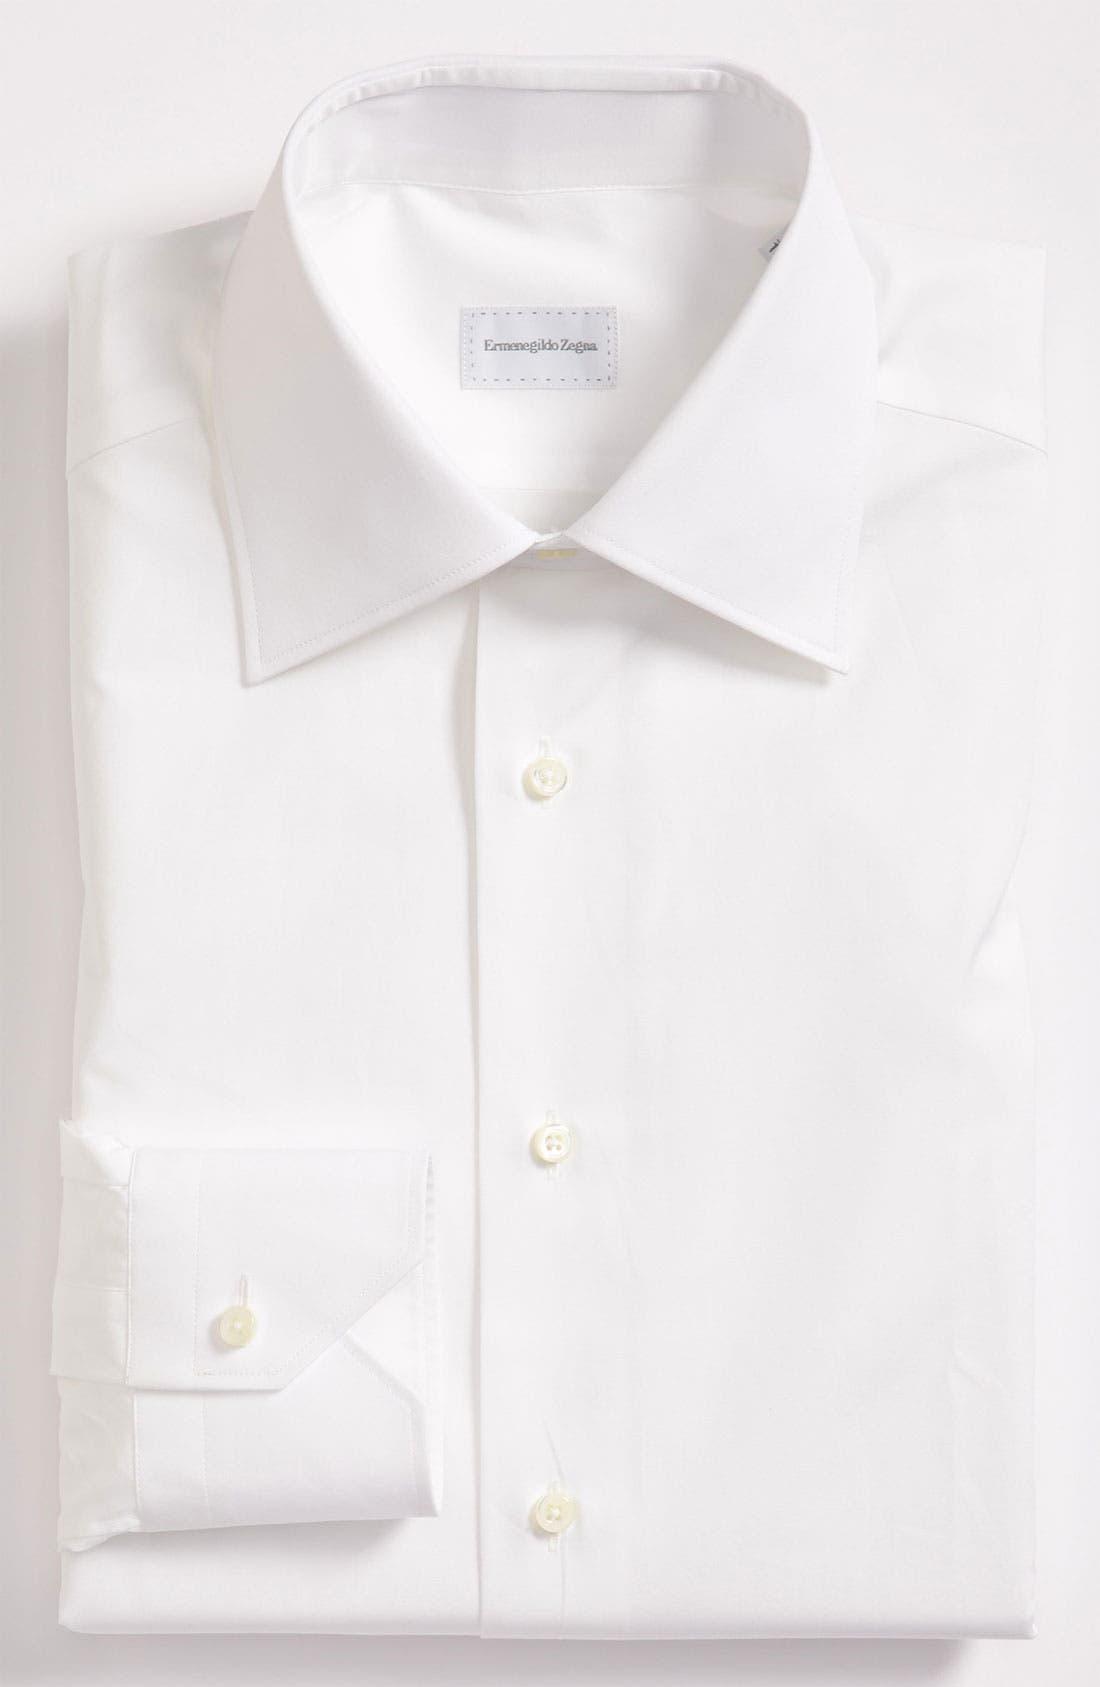 Alternate Image 1 Selected - Ermenegildo Zegna Tailored Fit Dress Shirt